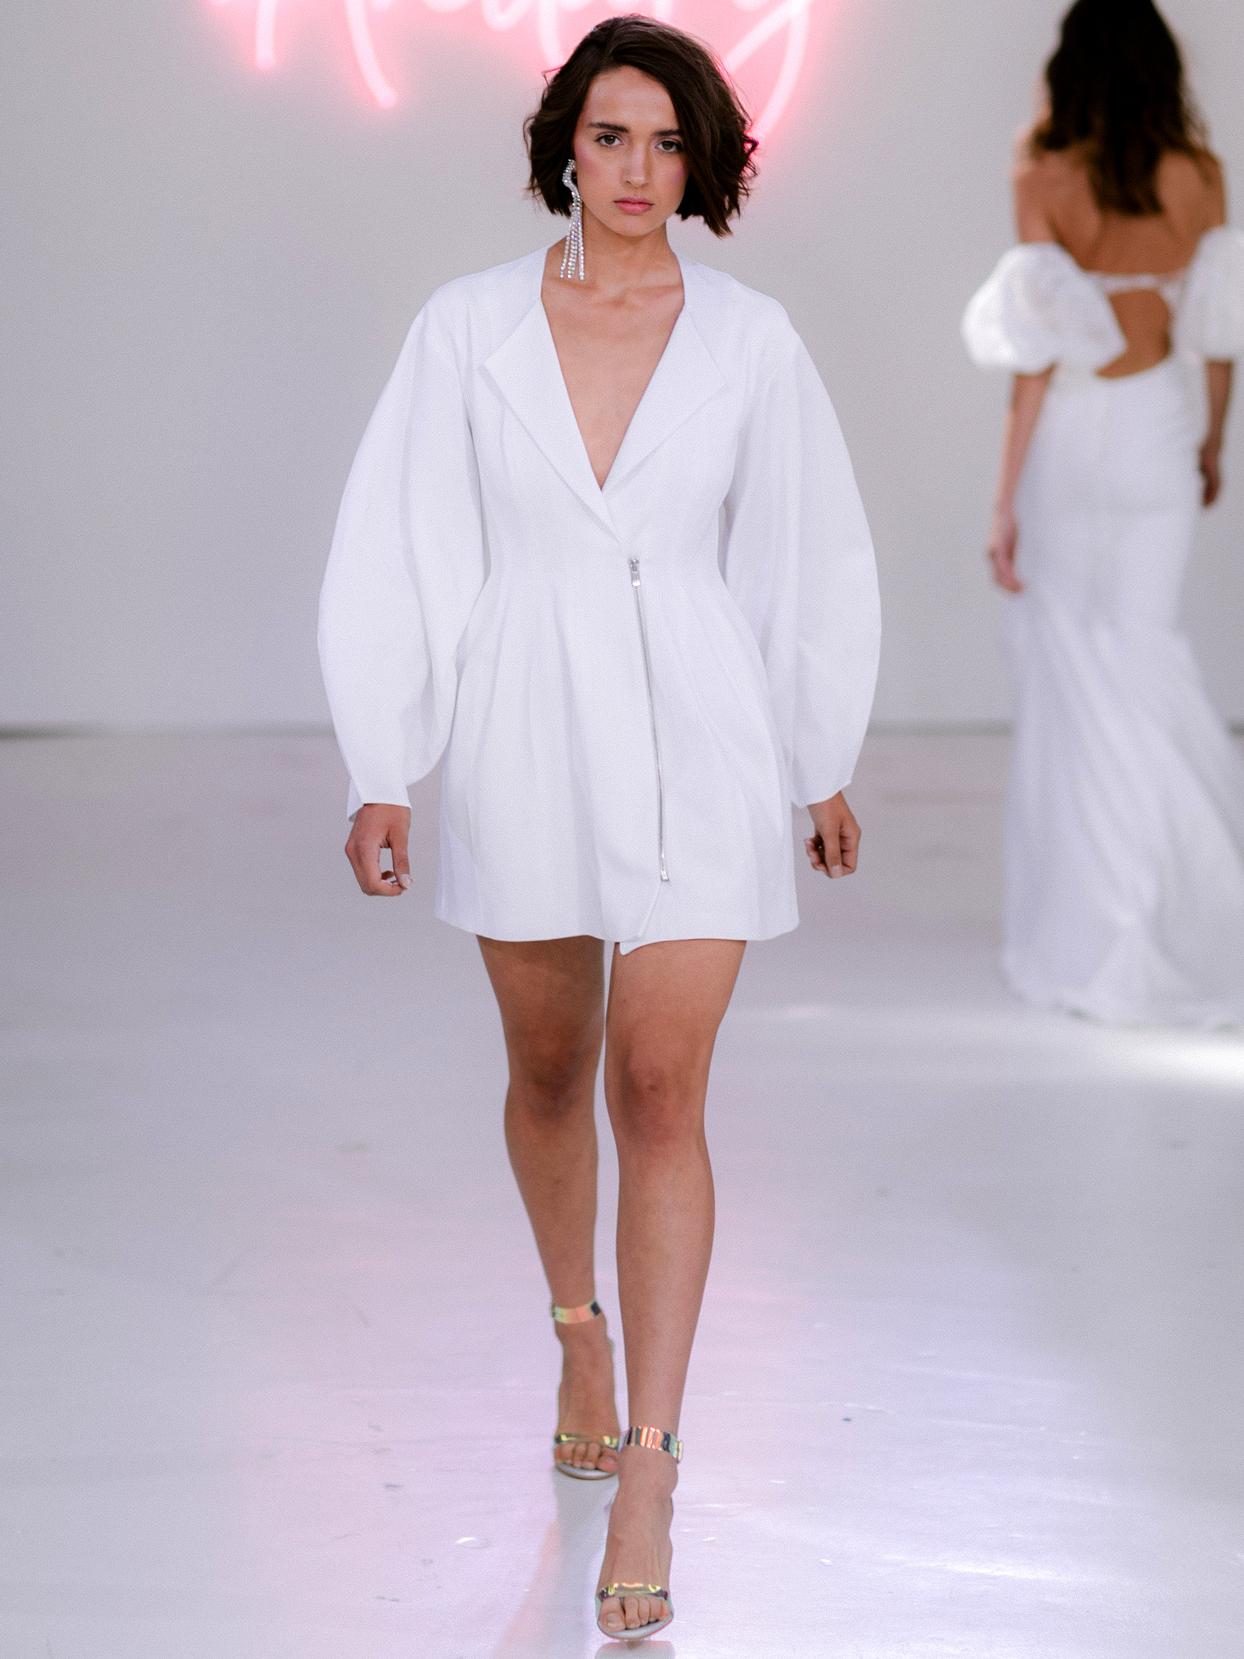 Rime Arodaky X The Mews Bridal long sleeve v-neck mini wedding dress fall 2020